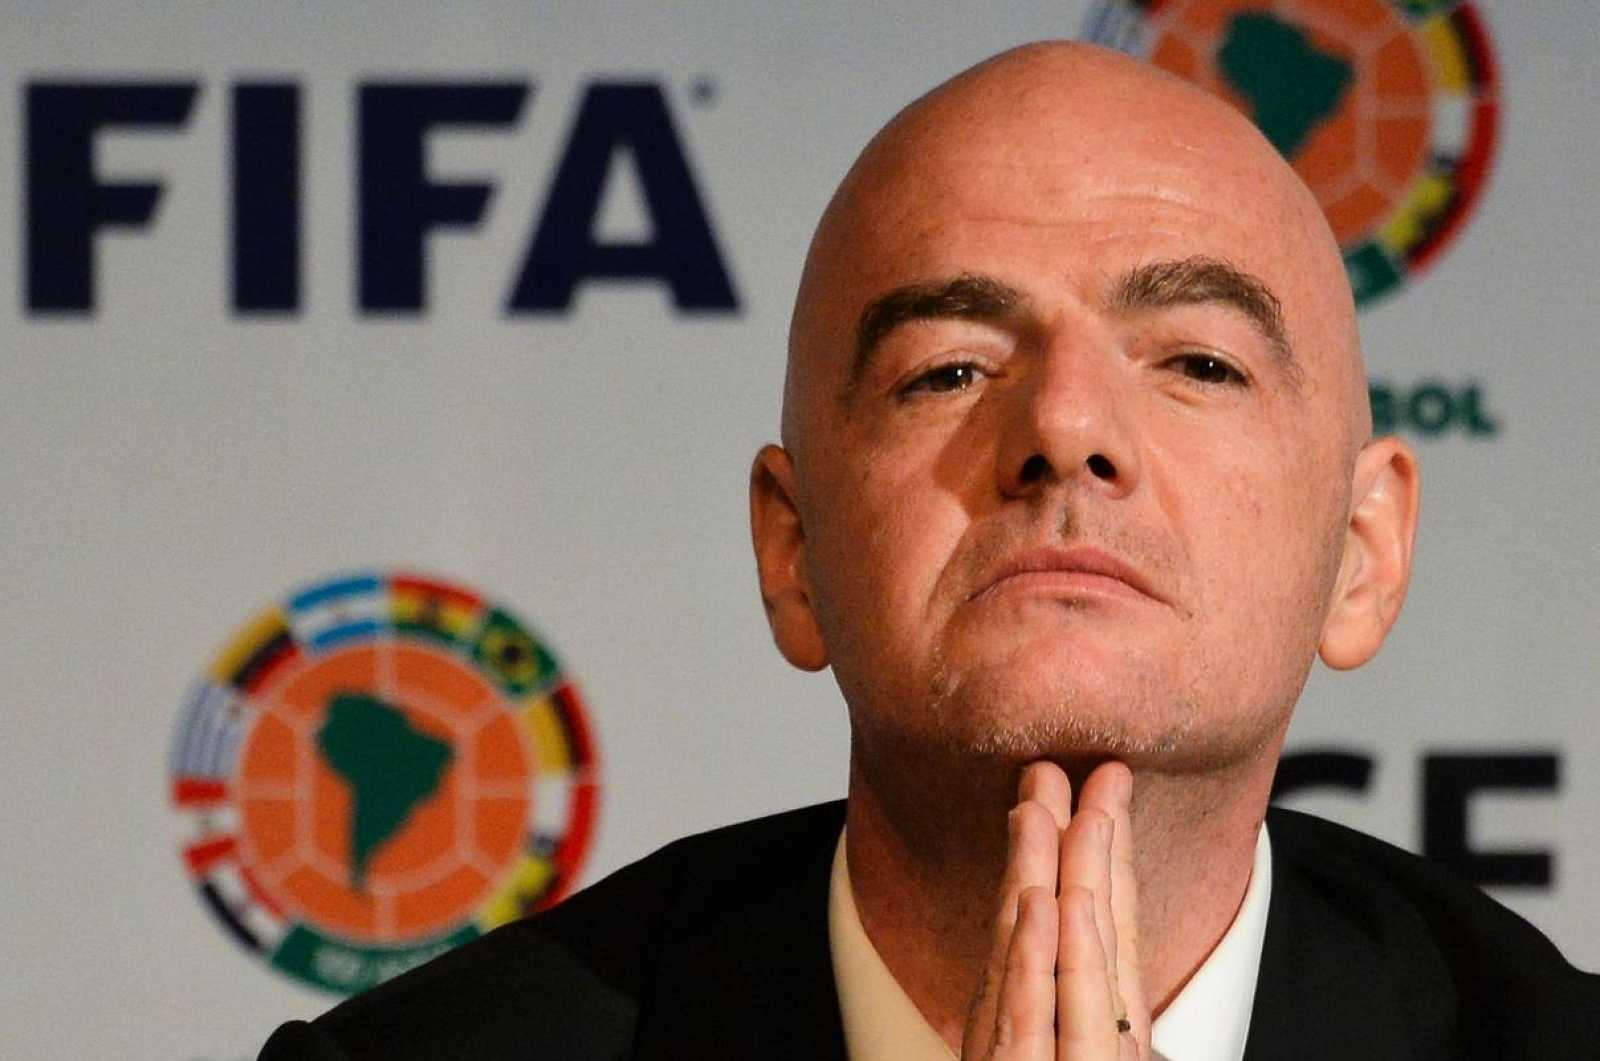 Foto de archivo del presidente de la FIFA, Gianni Infantino.